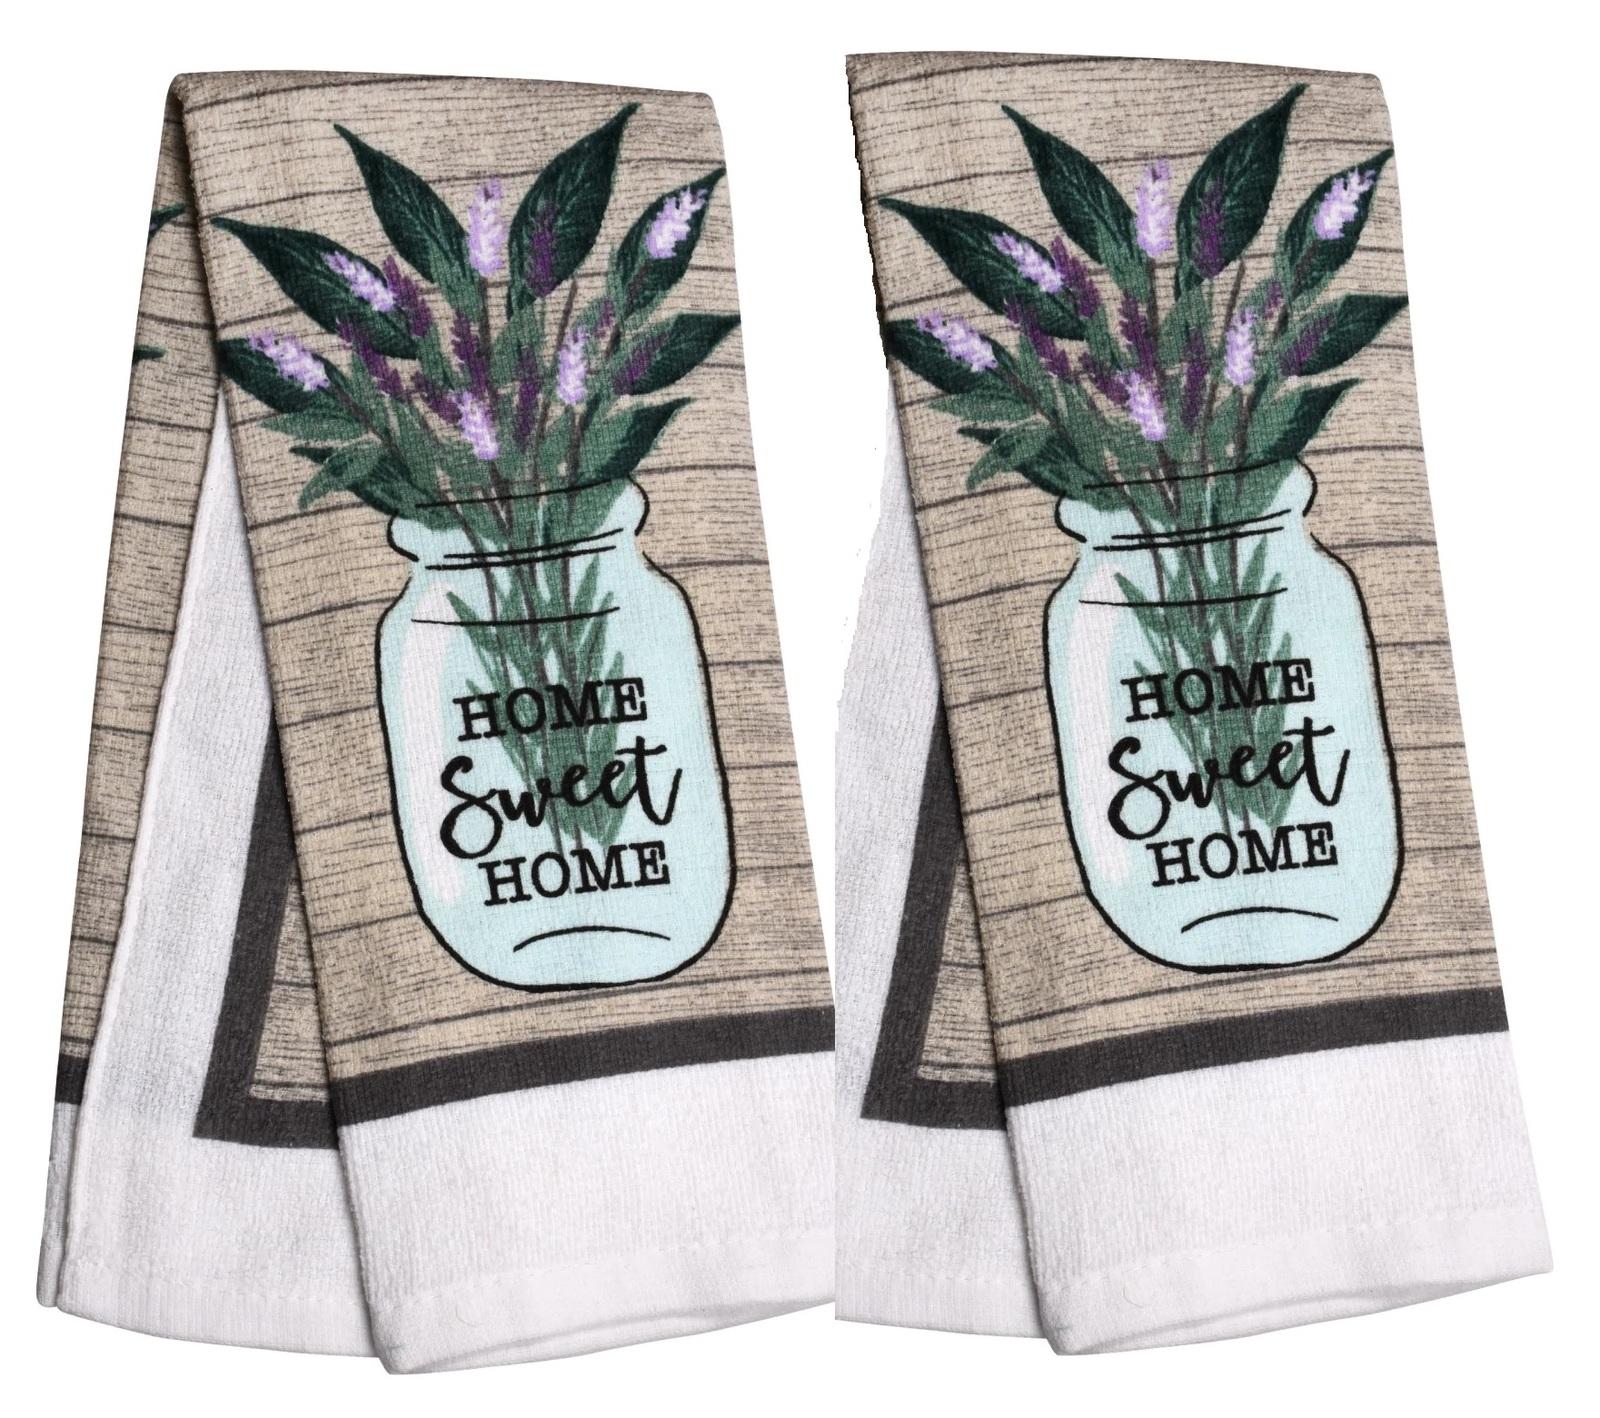 Homesweethome towel 3